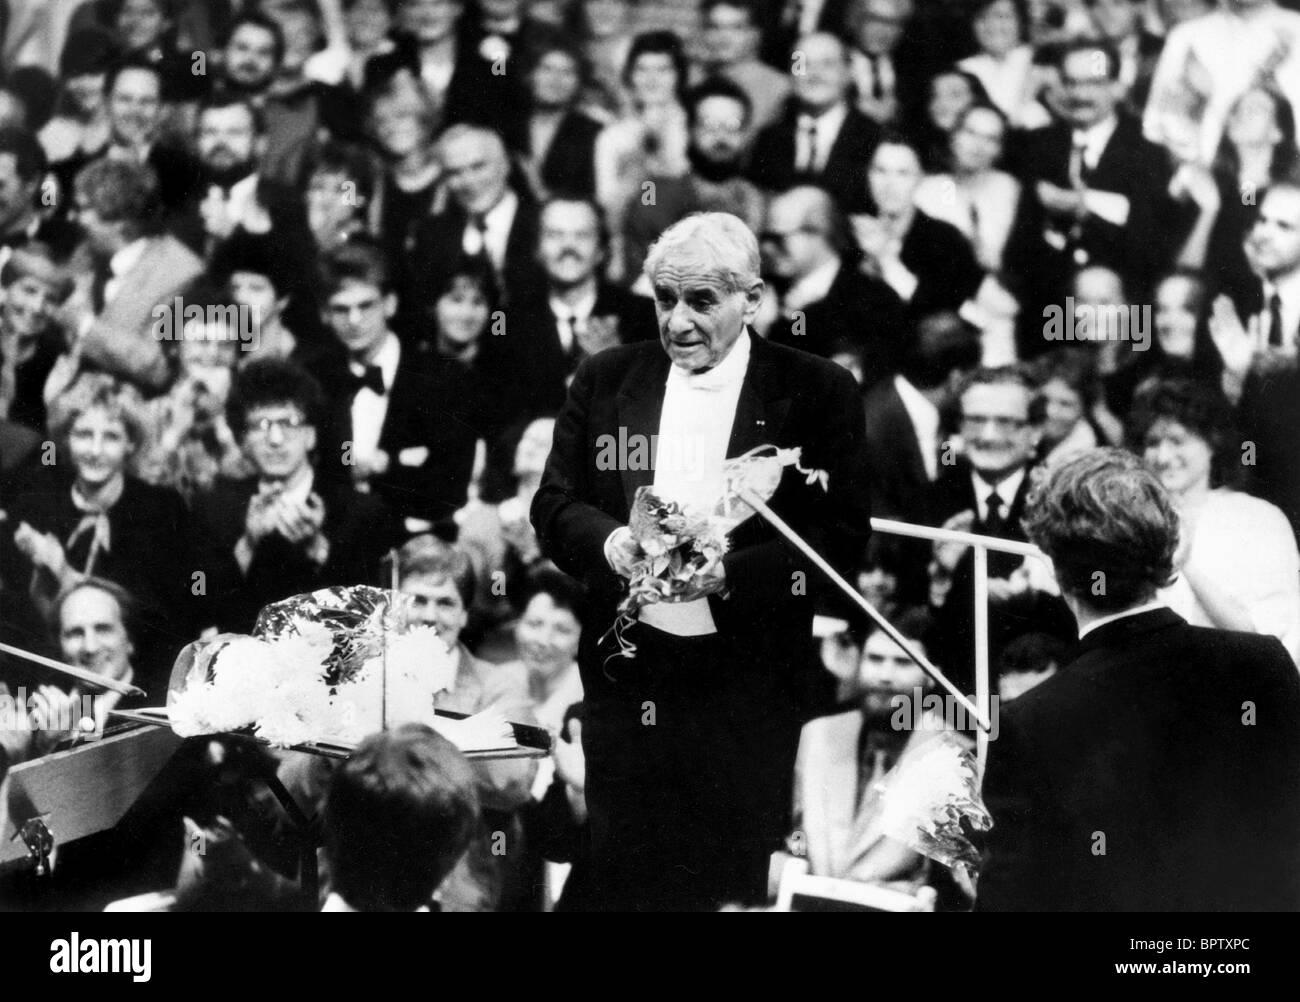 LEONARD BERNSTEIN MUSIC COMPOSER (1984) - Stock Image